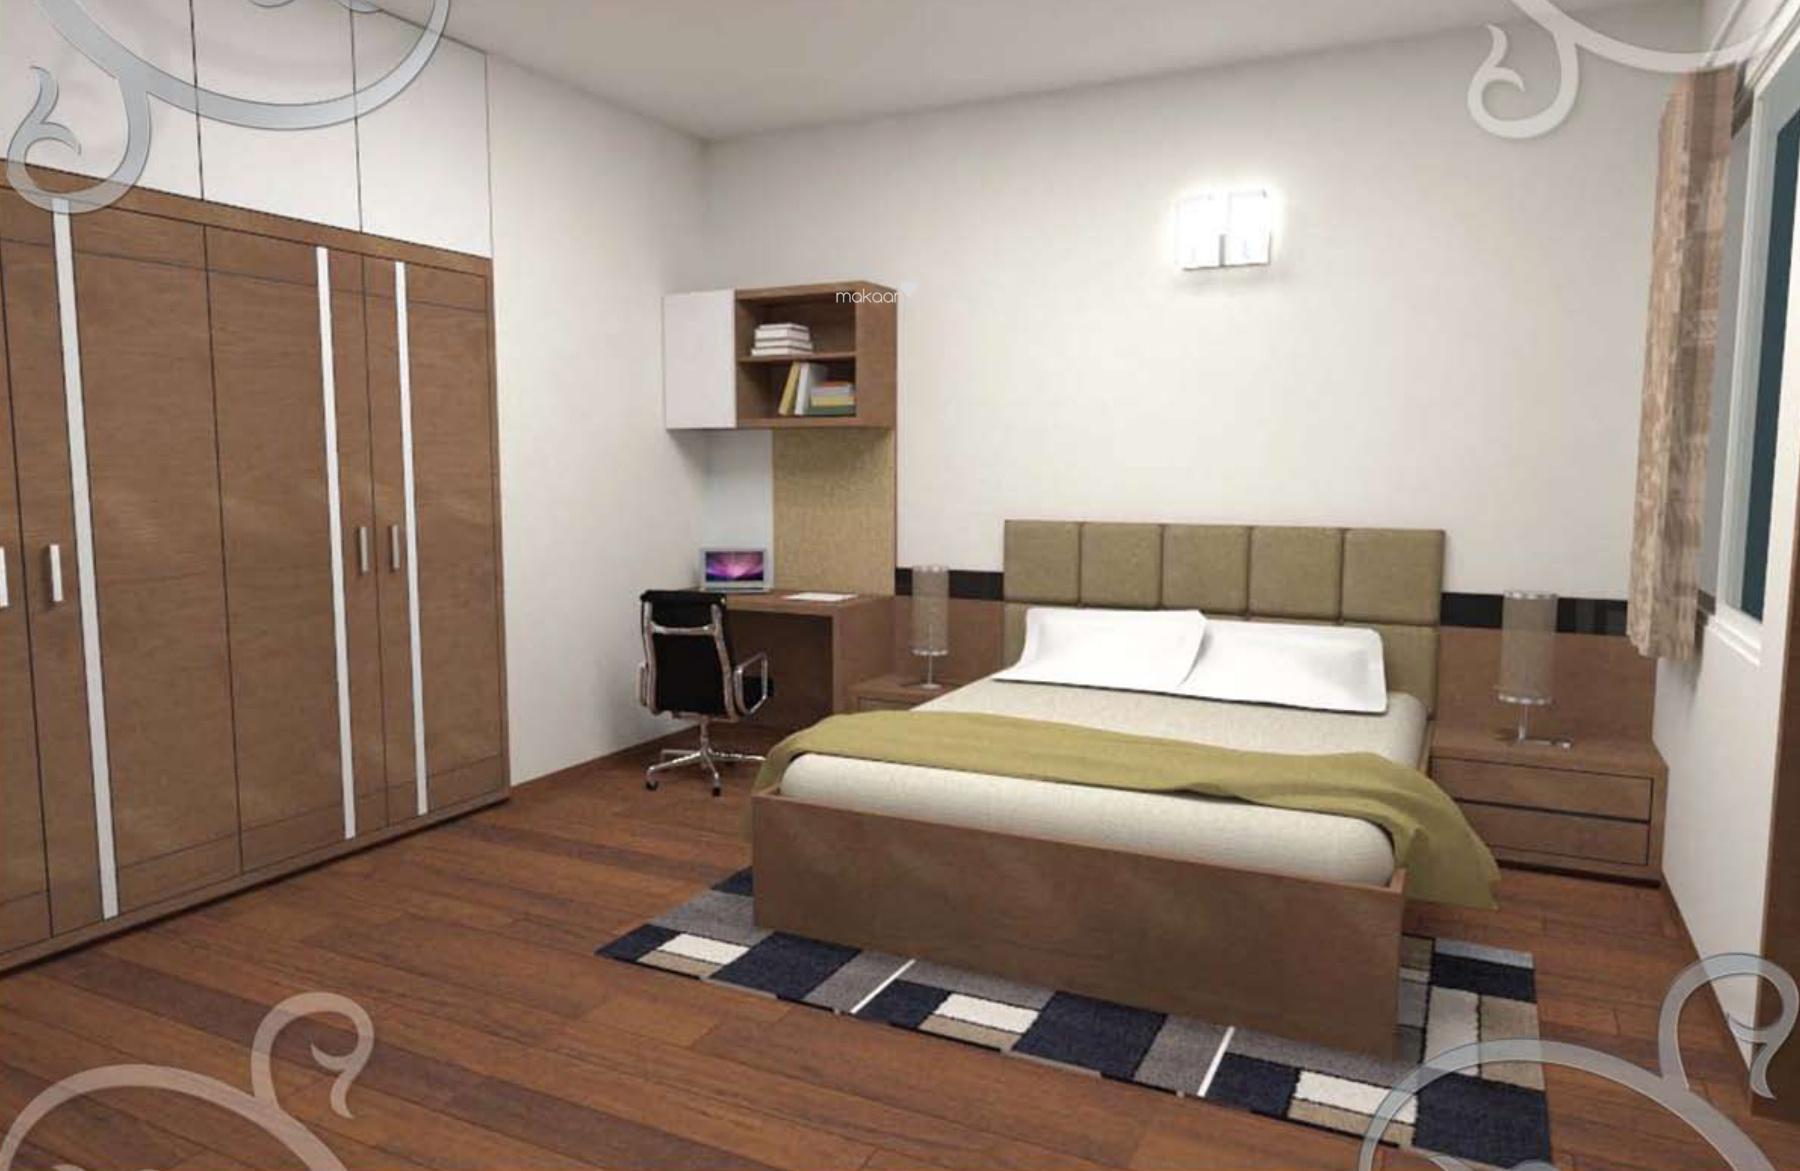 1831 sq ft 3BHK 3BHK+3T (1,831 sq ft) Property By Proptiger In Silver Crest, Bellandur